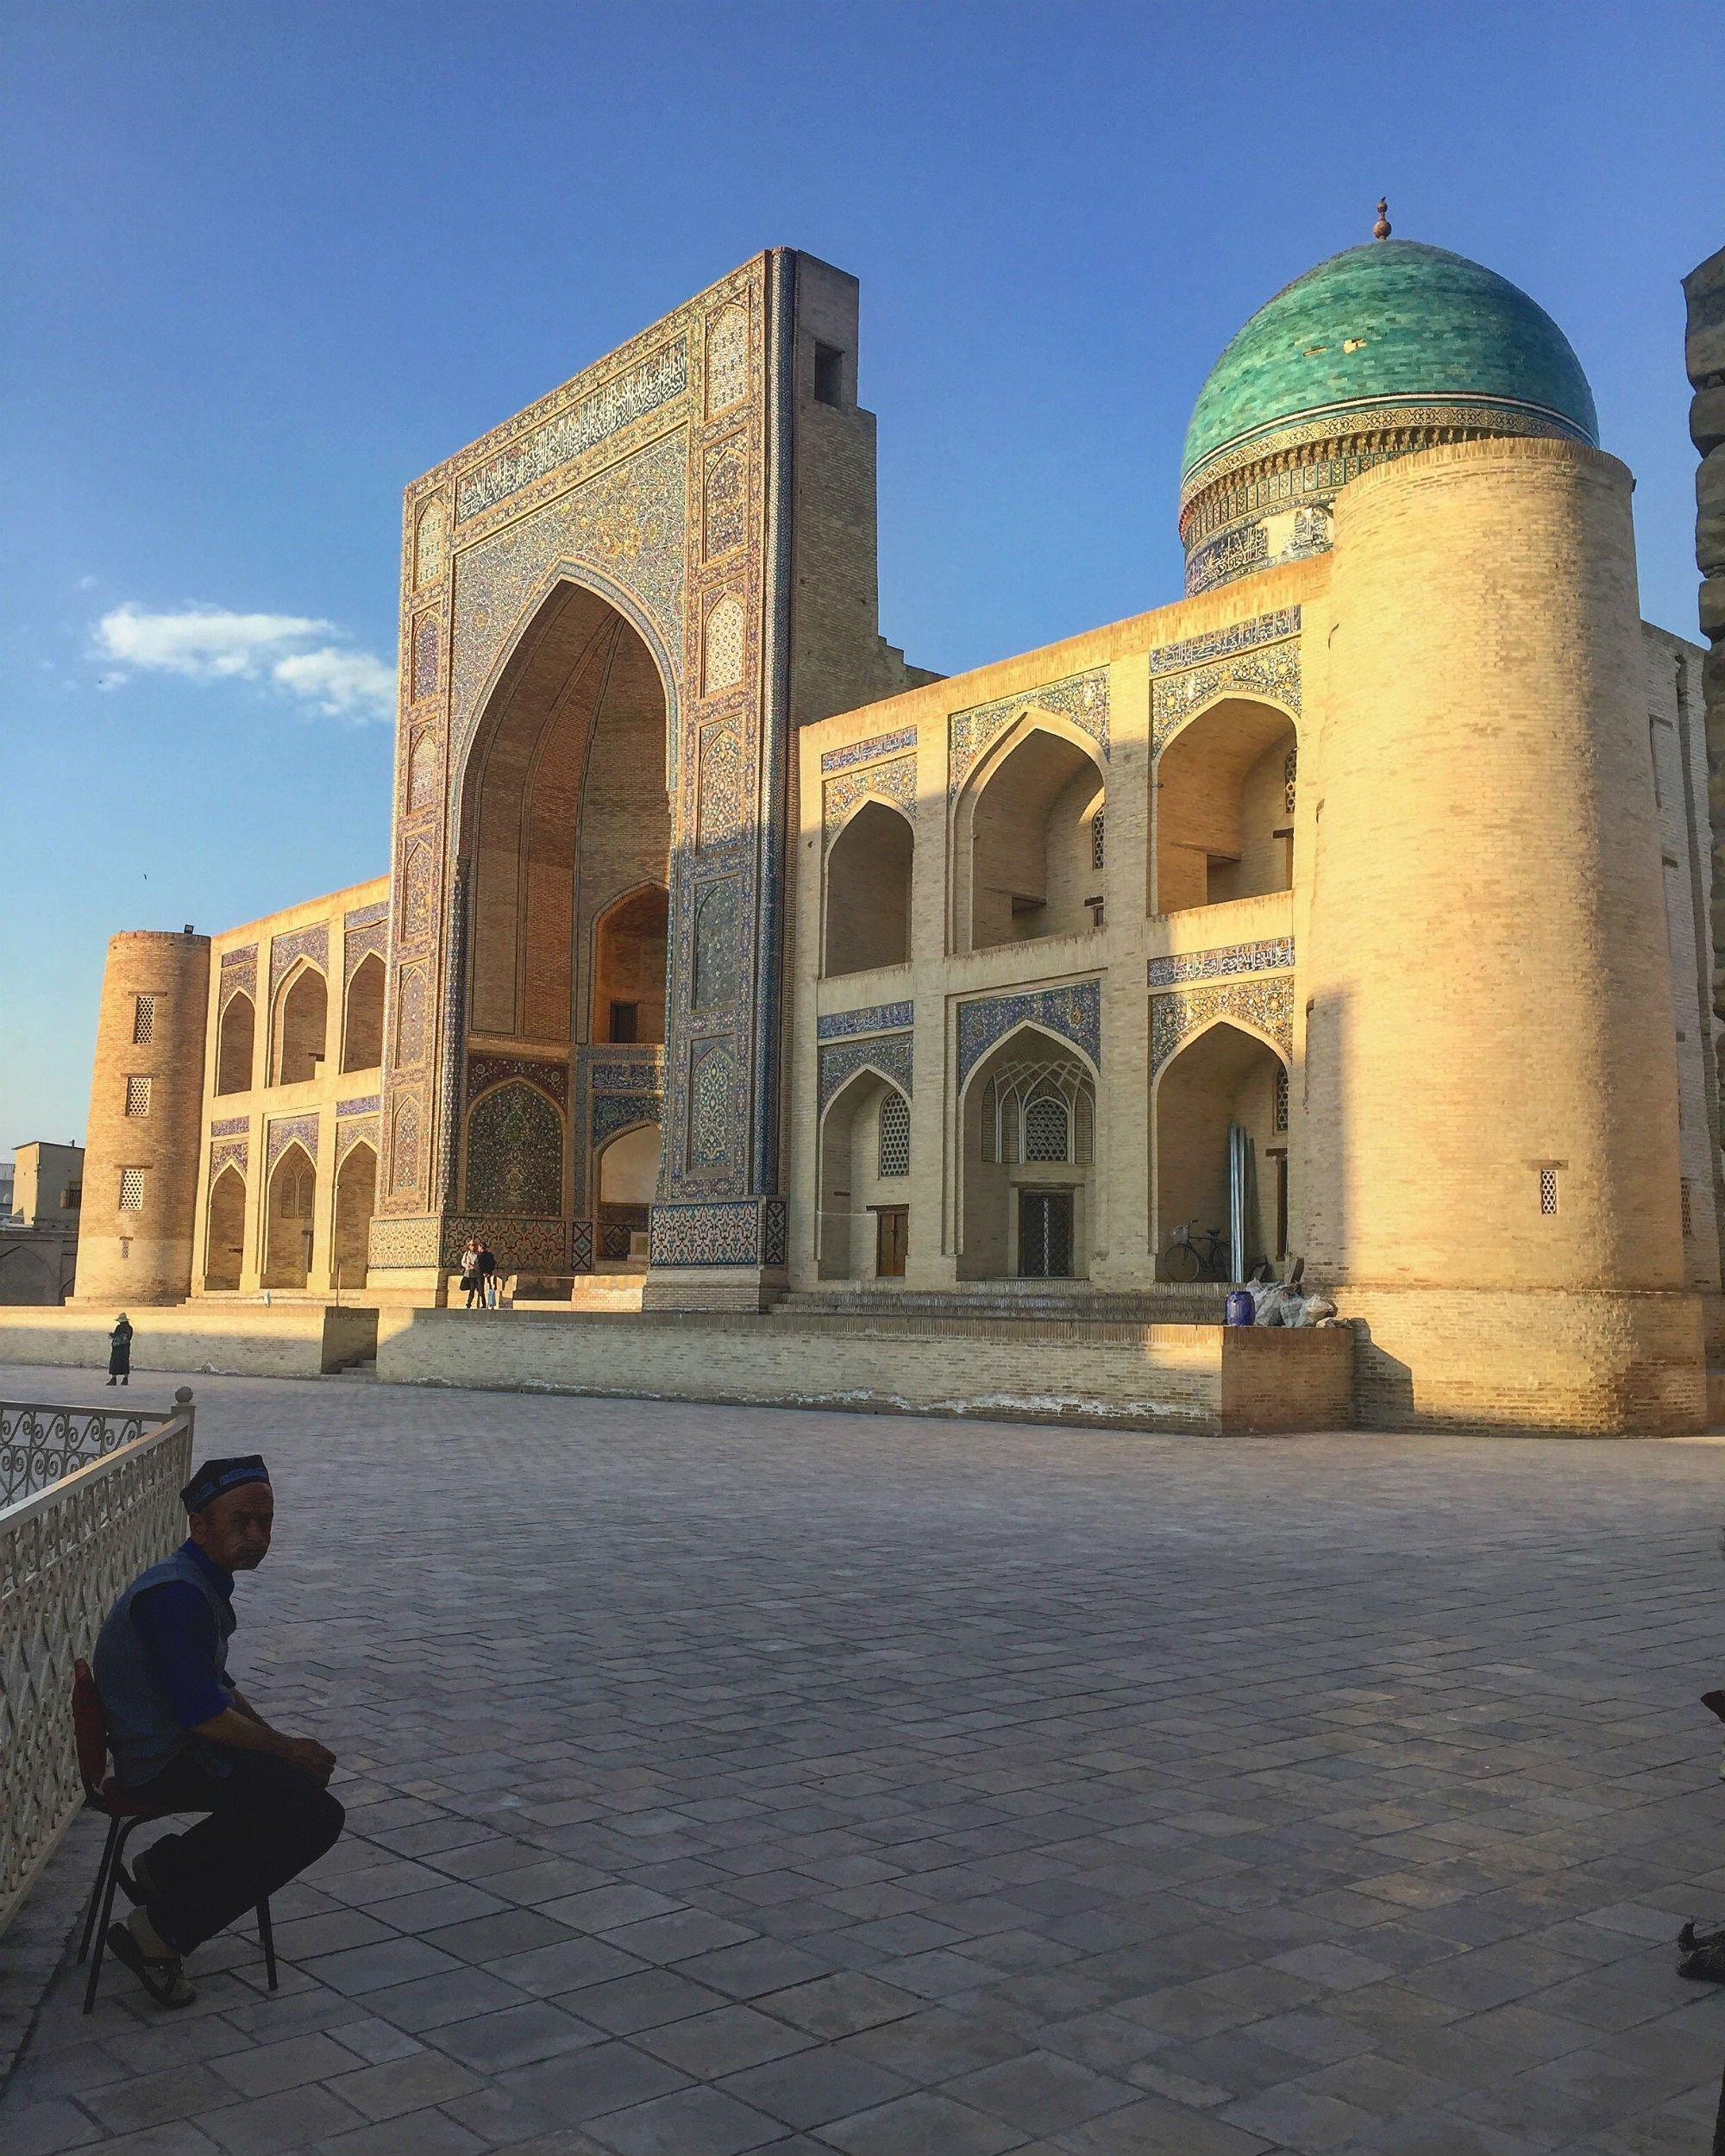 UZBEKISTAN Bukhara Mir i Arab Madrasa VIAGGIO IN UZBEKISTAN